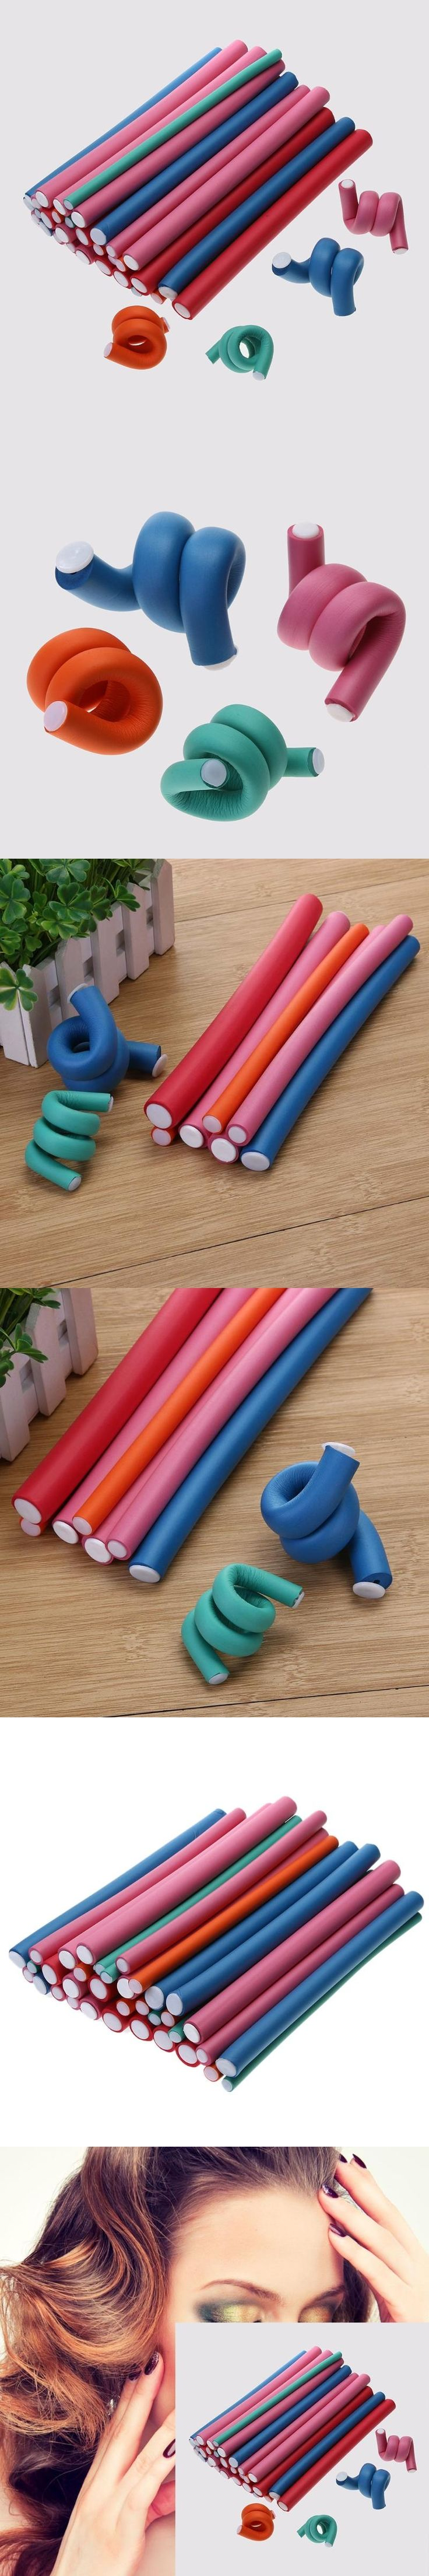 36Pcs/set Soft Hair Curler DIY Spongia Foam Twist Curls Flexible Curling Rod Hair Roller Curler Makers Styling Tool Random